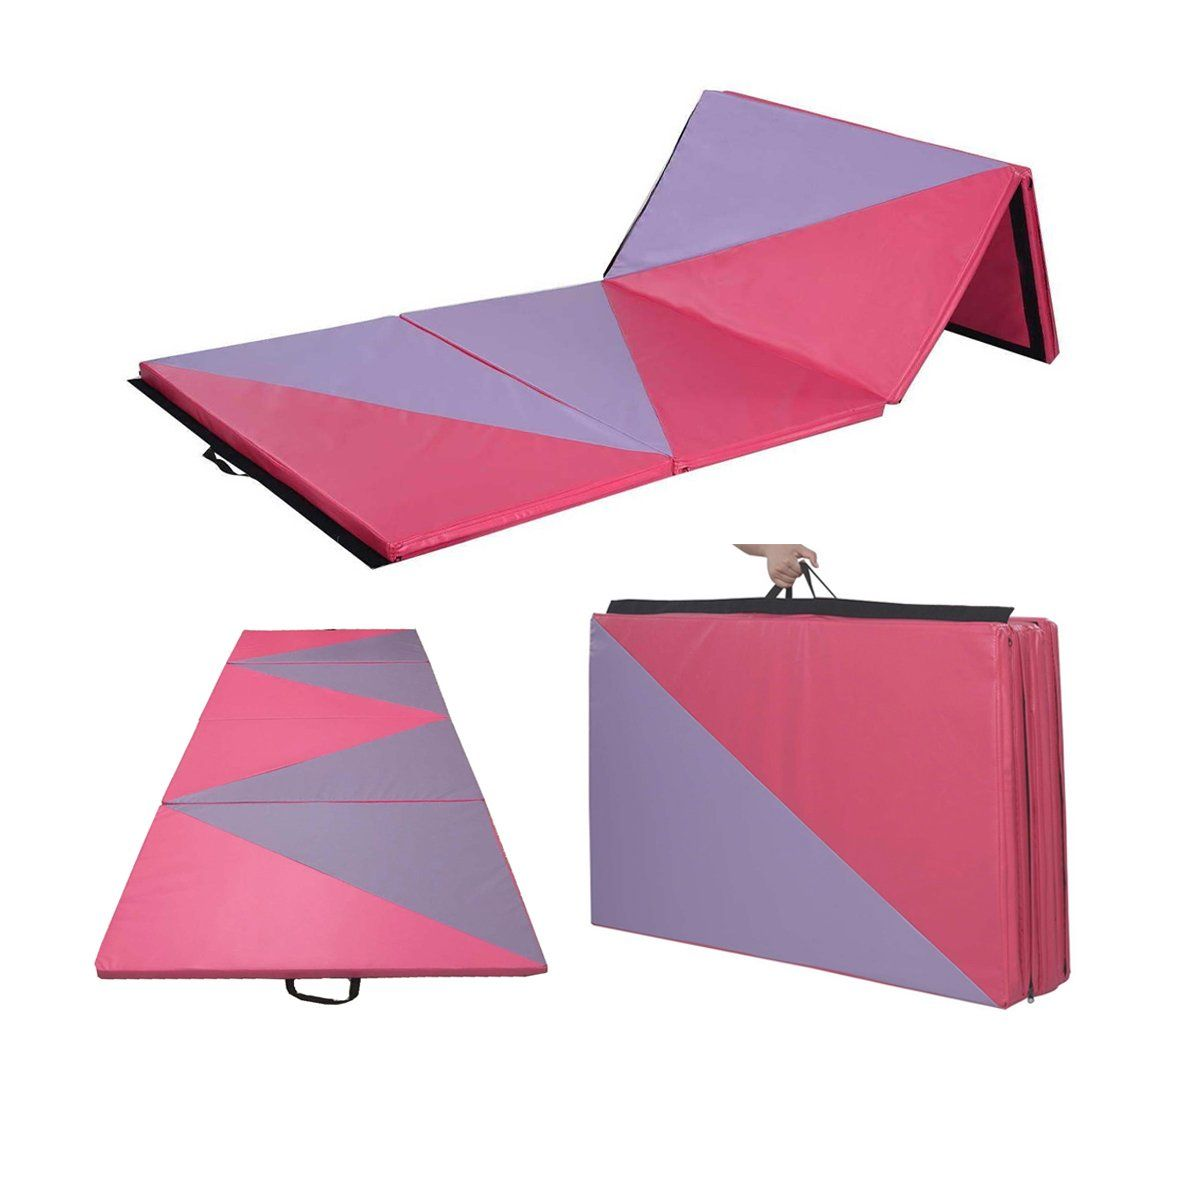 4 X10 X2 Thick Gymnastics Mat Folding Yoga Mat Panel